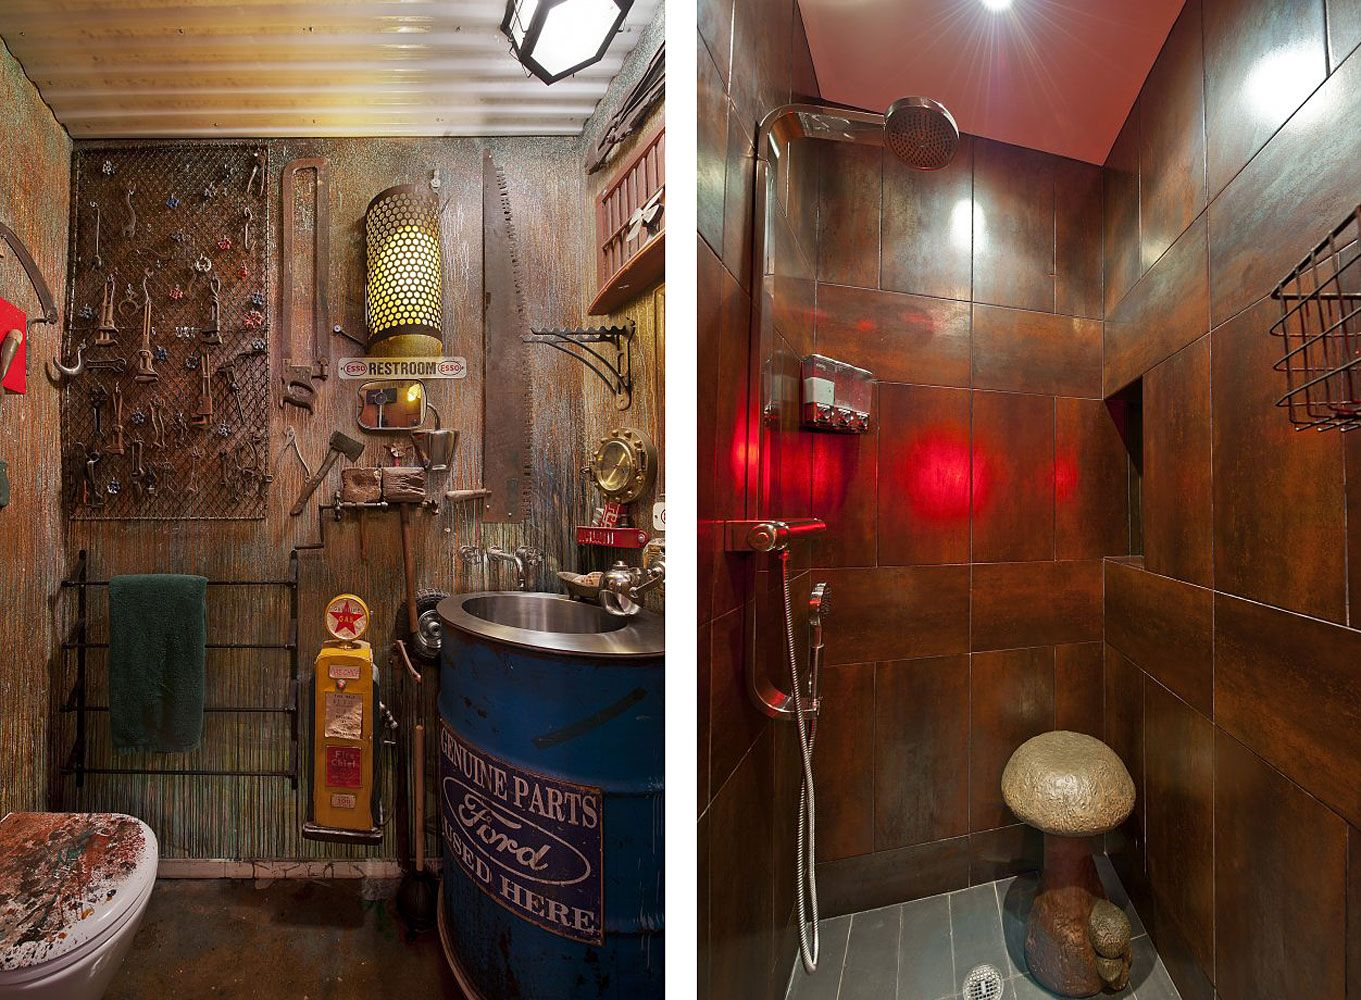 Cool Steampunk Bedroom Interior Decorating Design Ideas | Steampunk ...